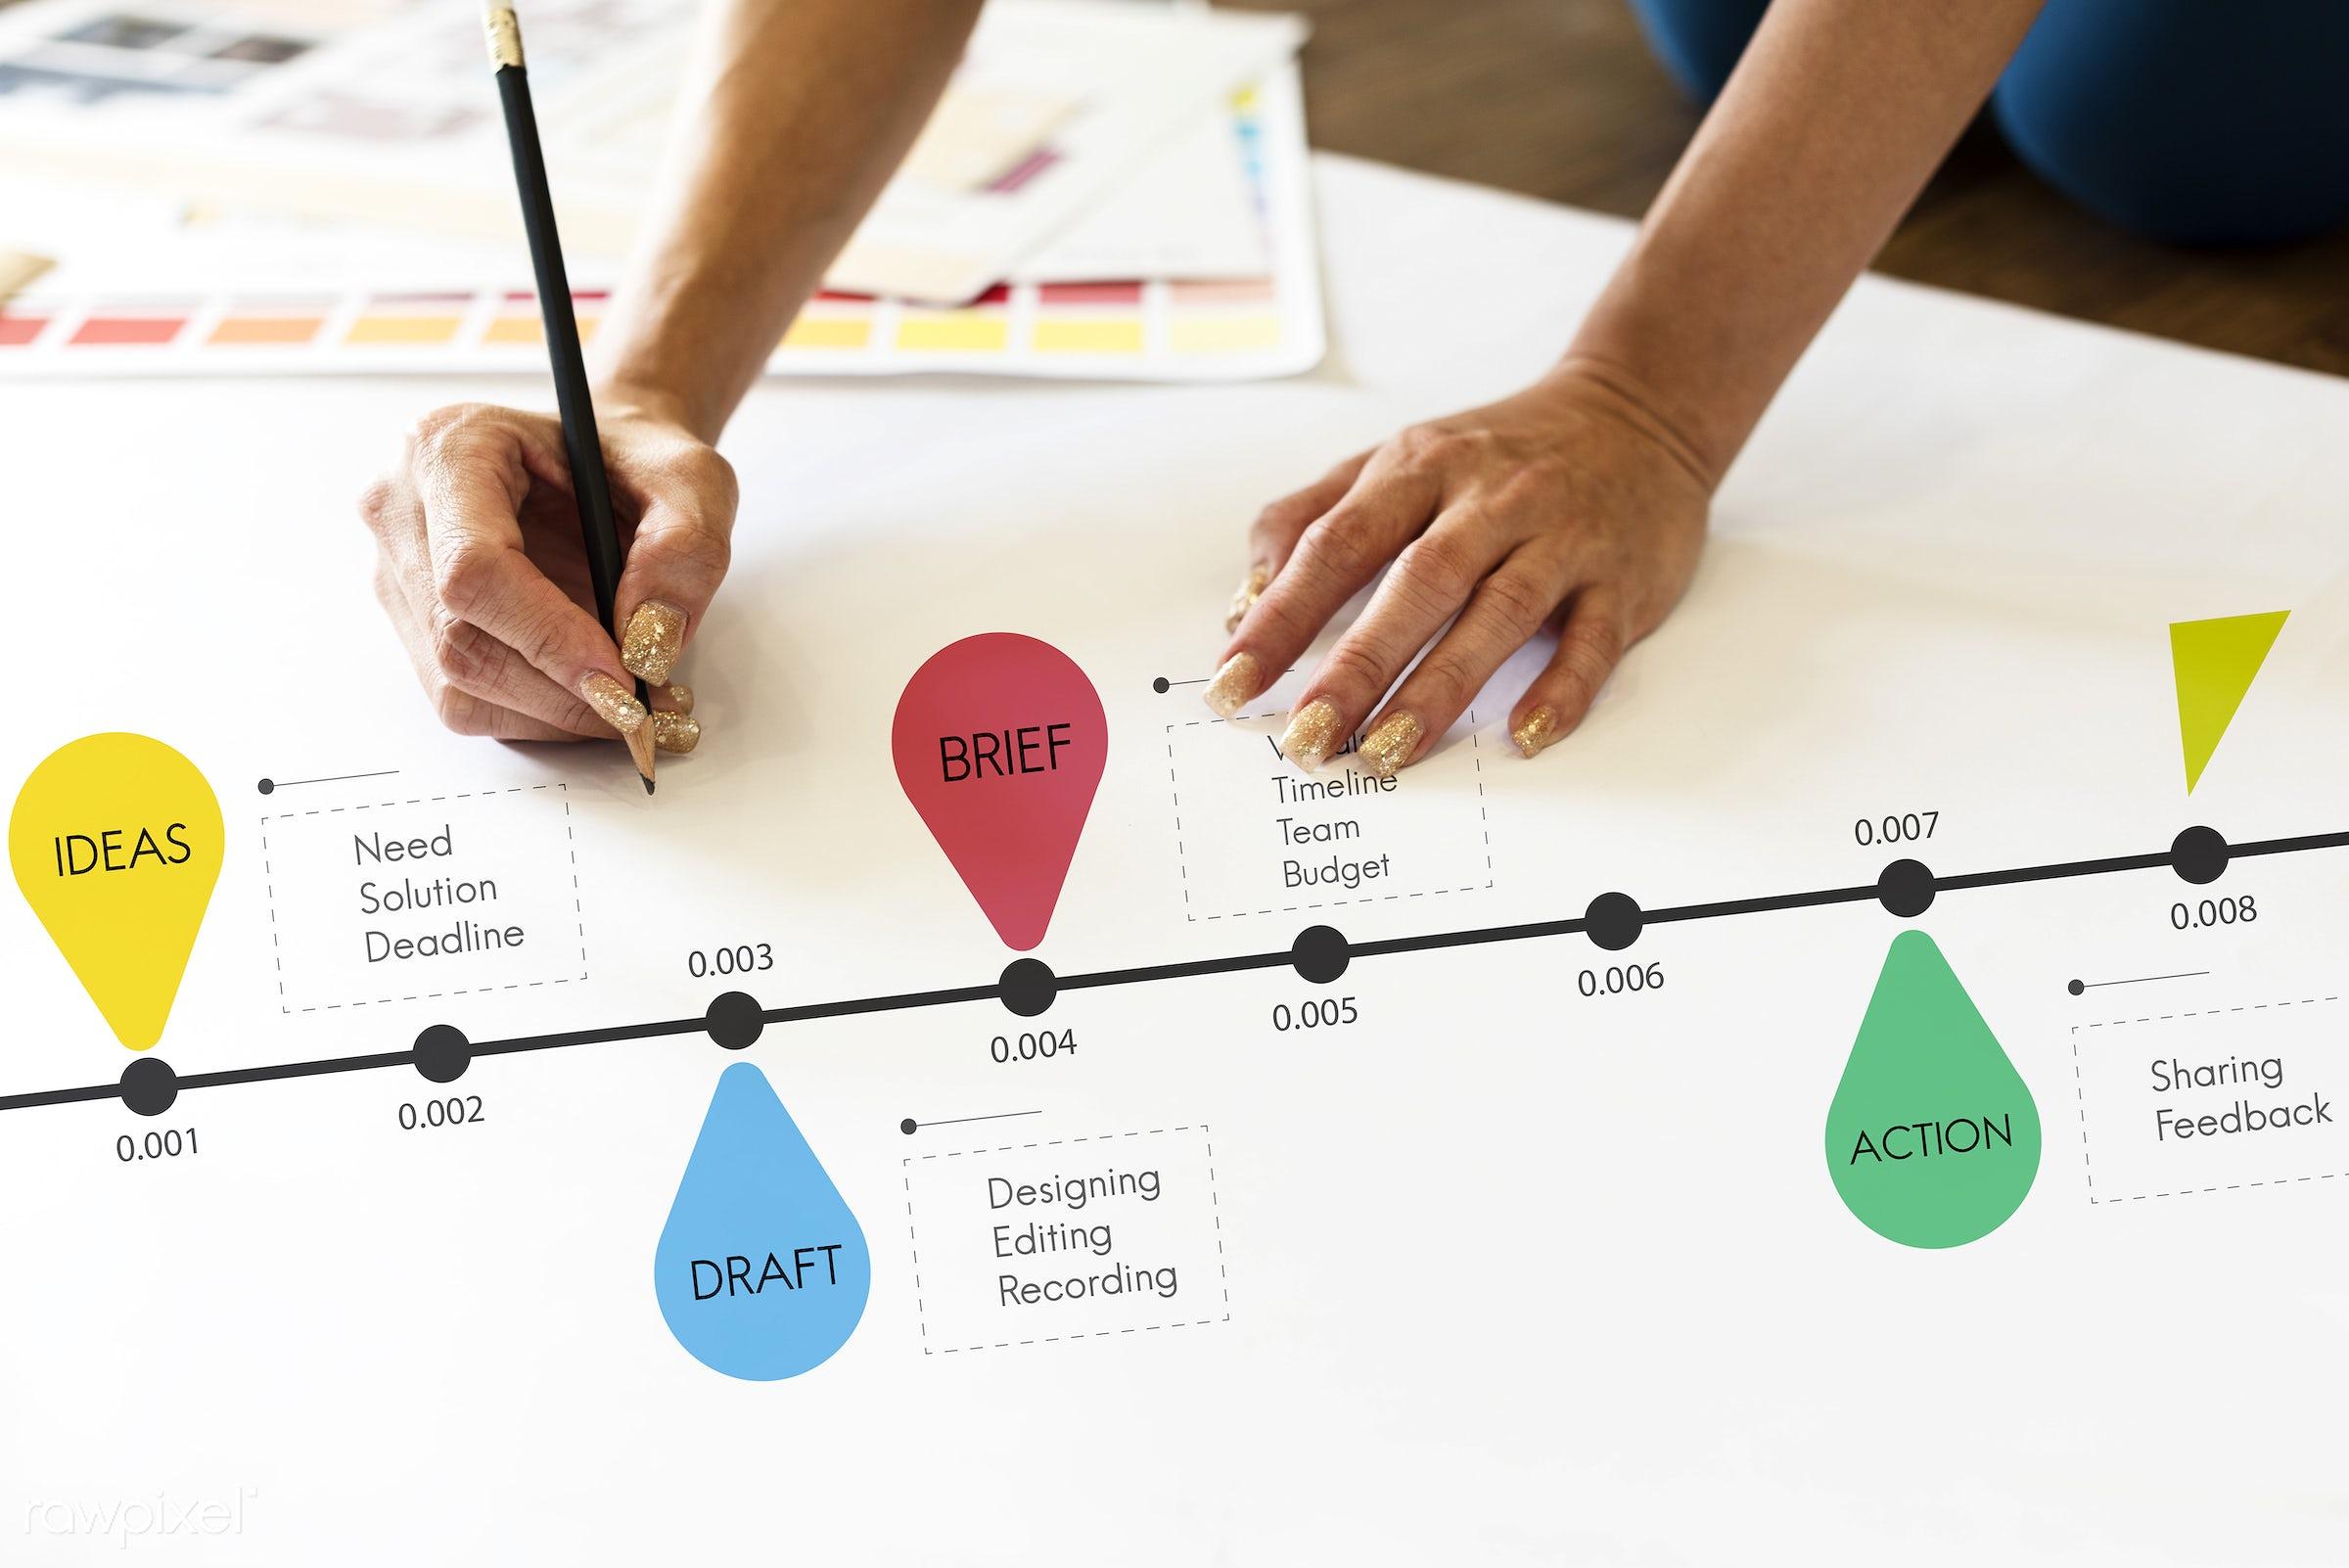 editing, timeline, actions, art, brief, budget, creation, creative, creativity, deadline, design, designing, diagram, draft...